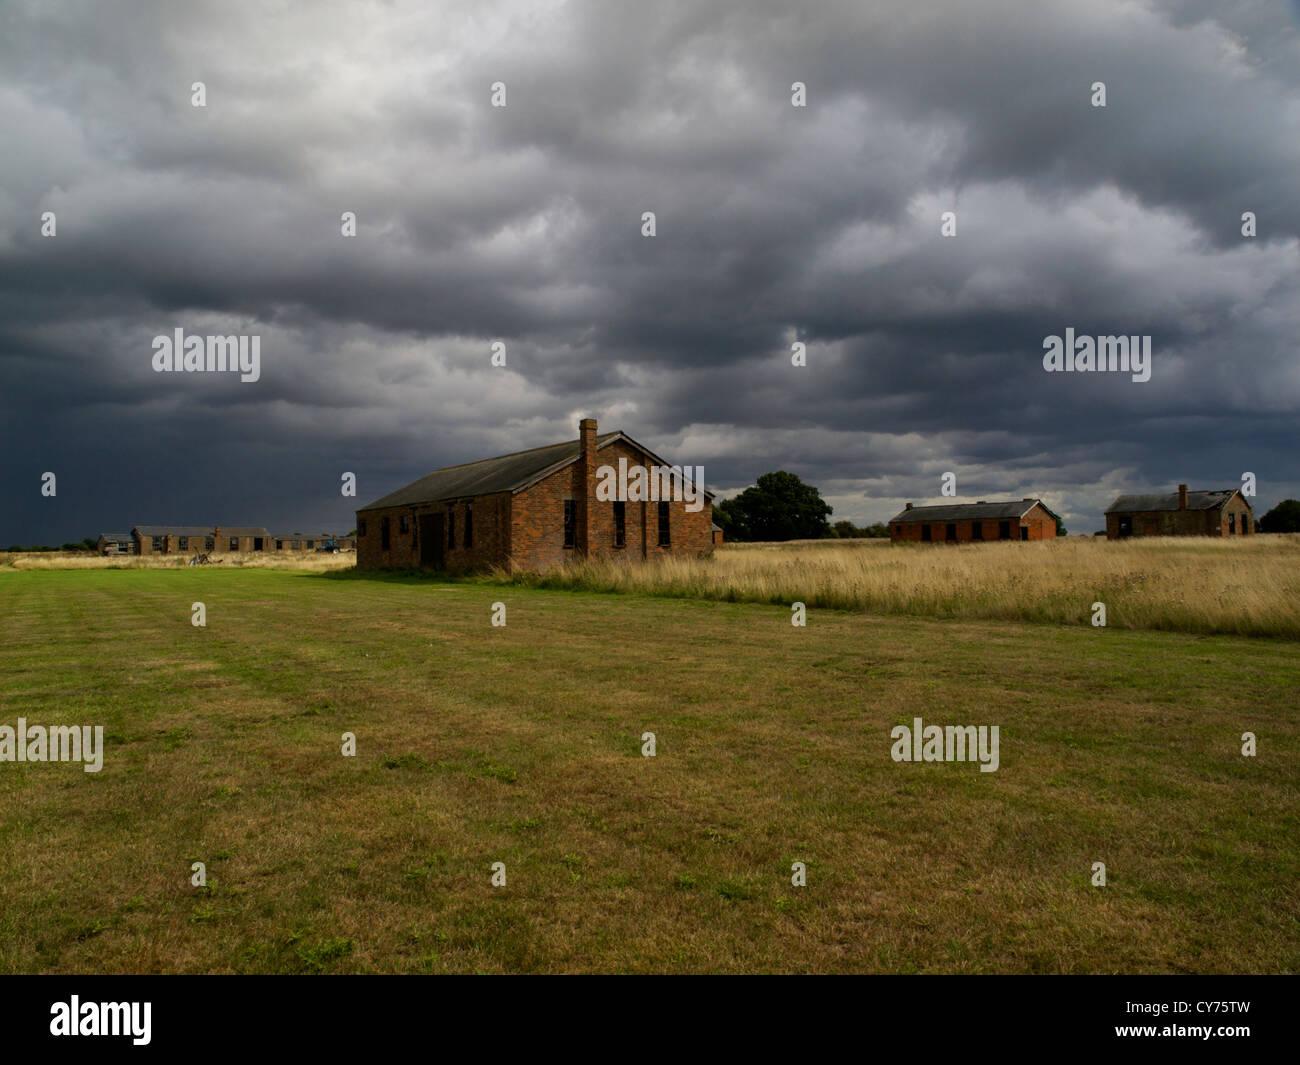 Stow Maries World War 1 Airfield, under stormy Essex skies. - Stock Image